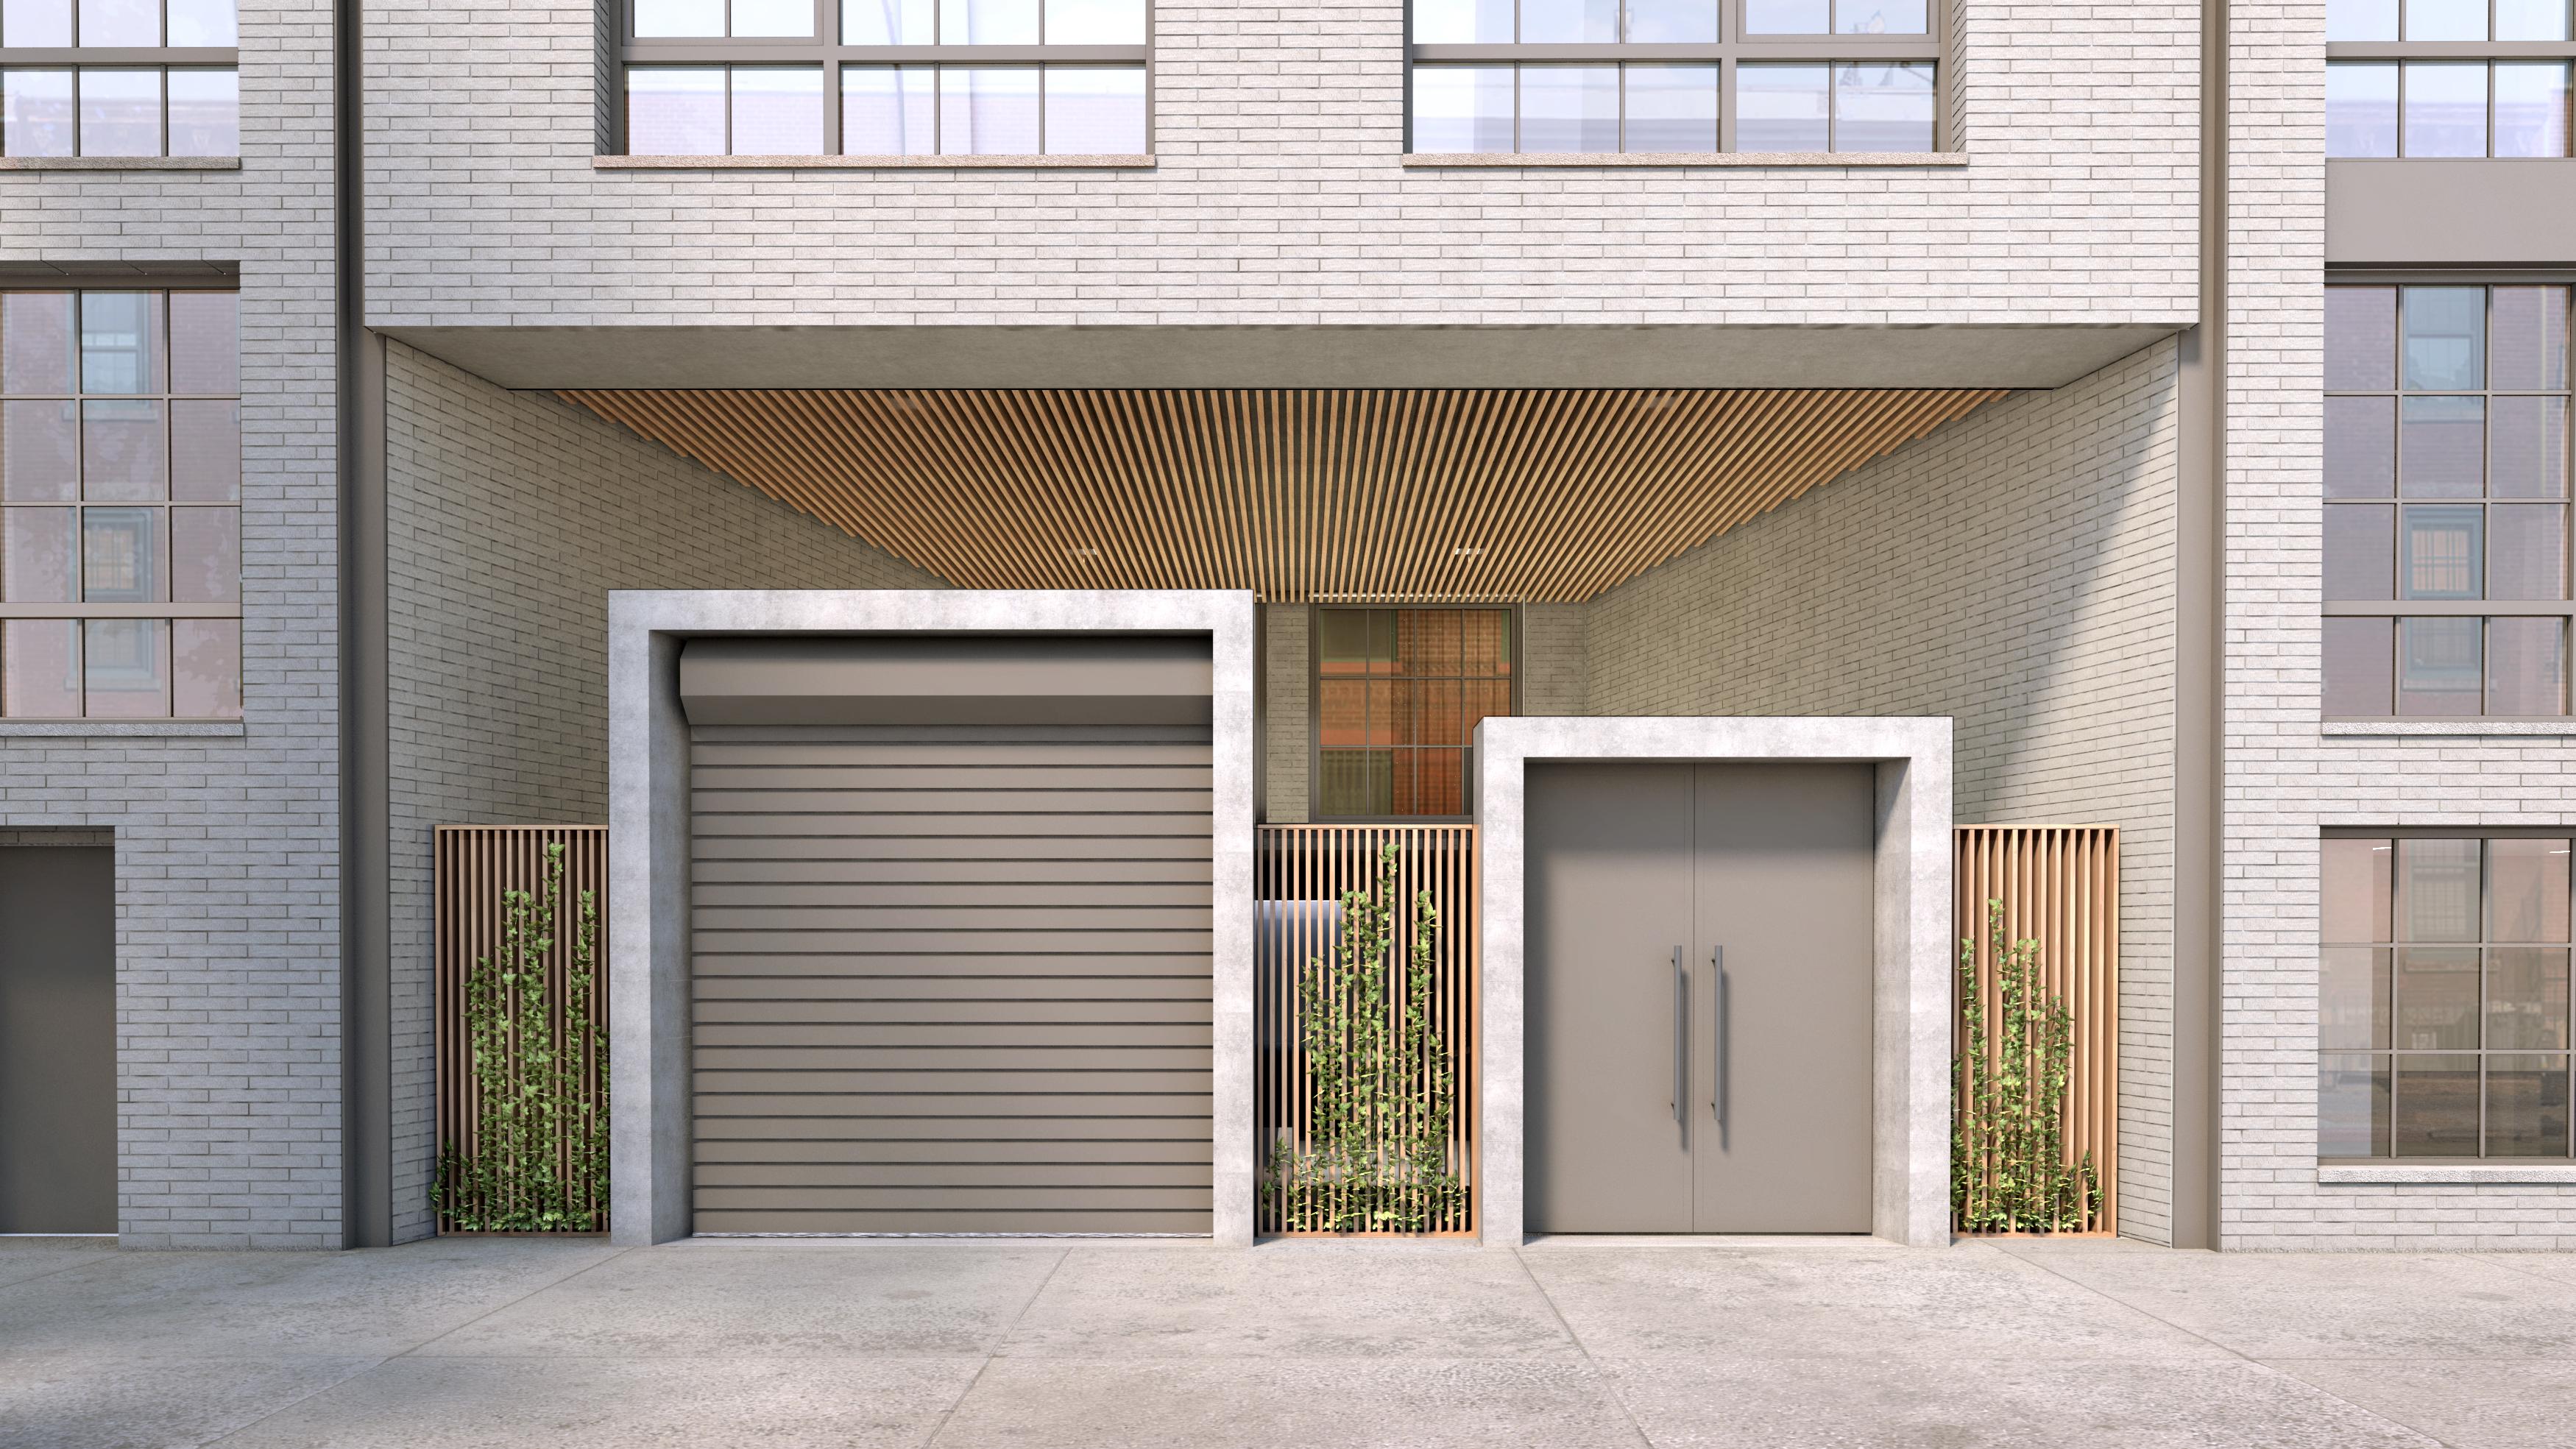 Apartment for sale at 77 Clarkson Avenue, Apt 6A